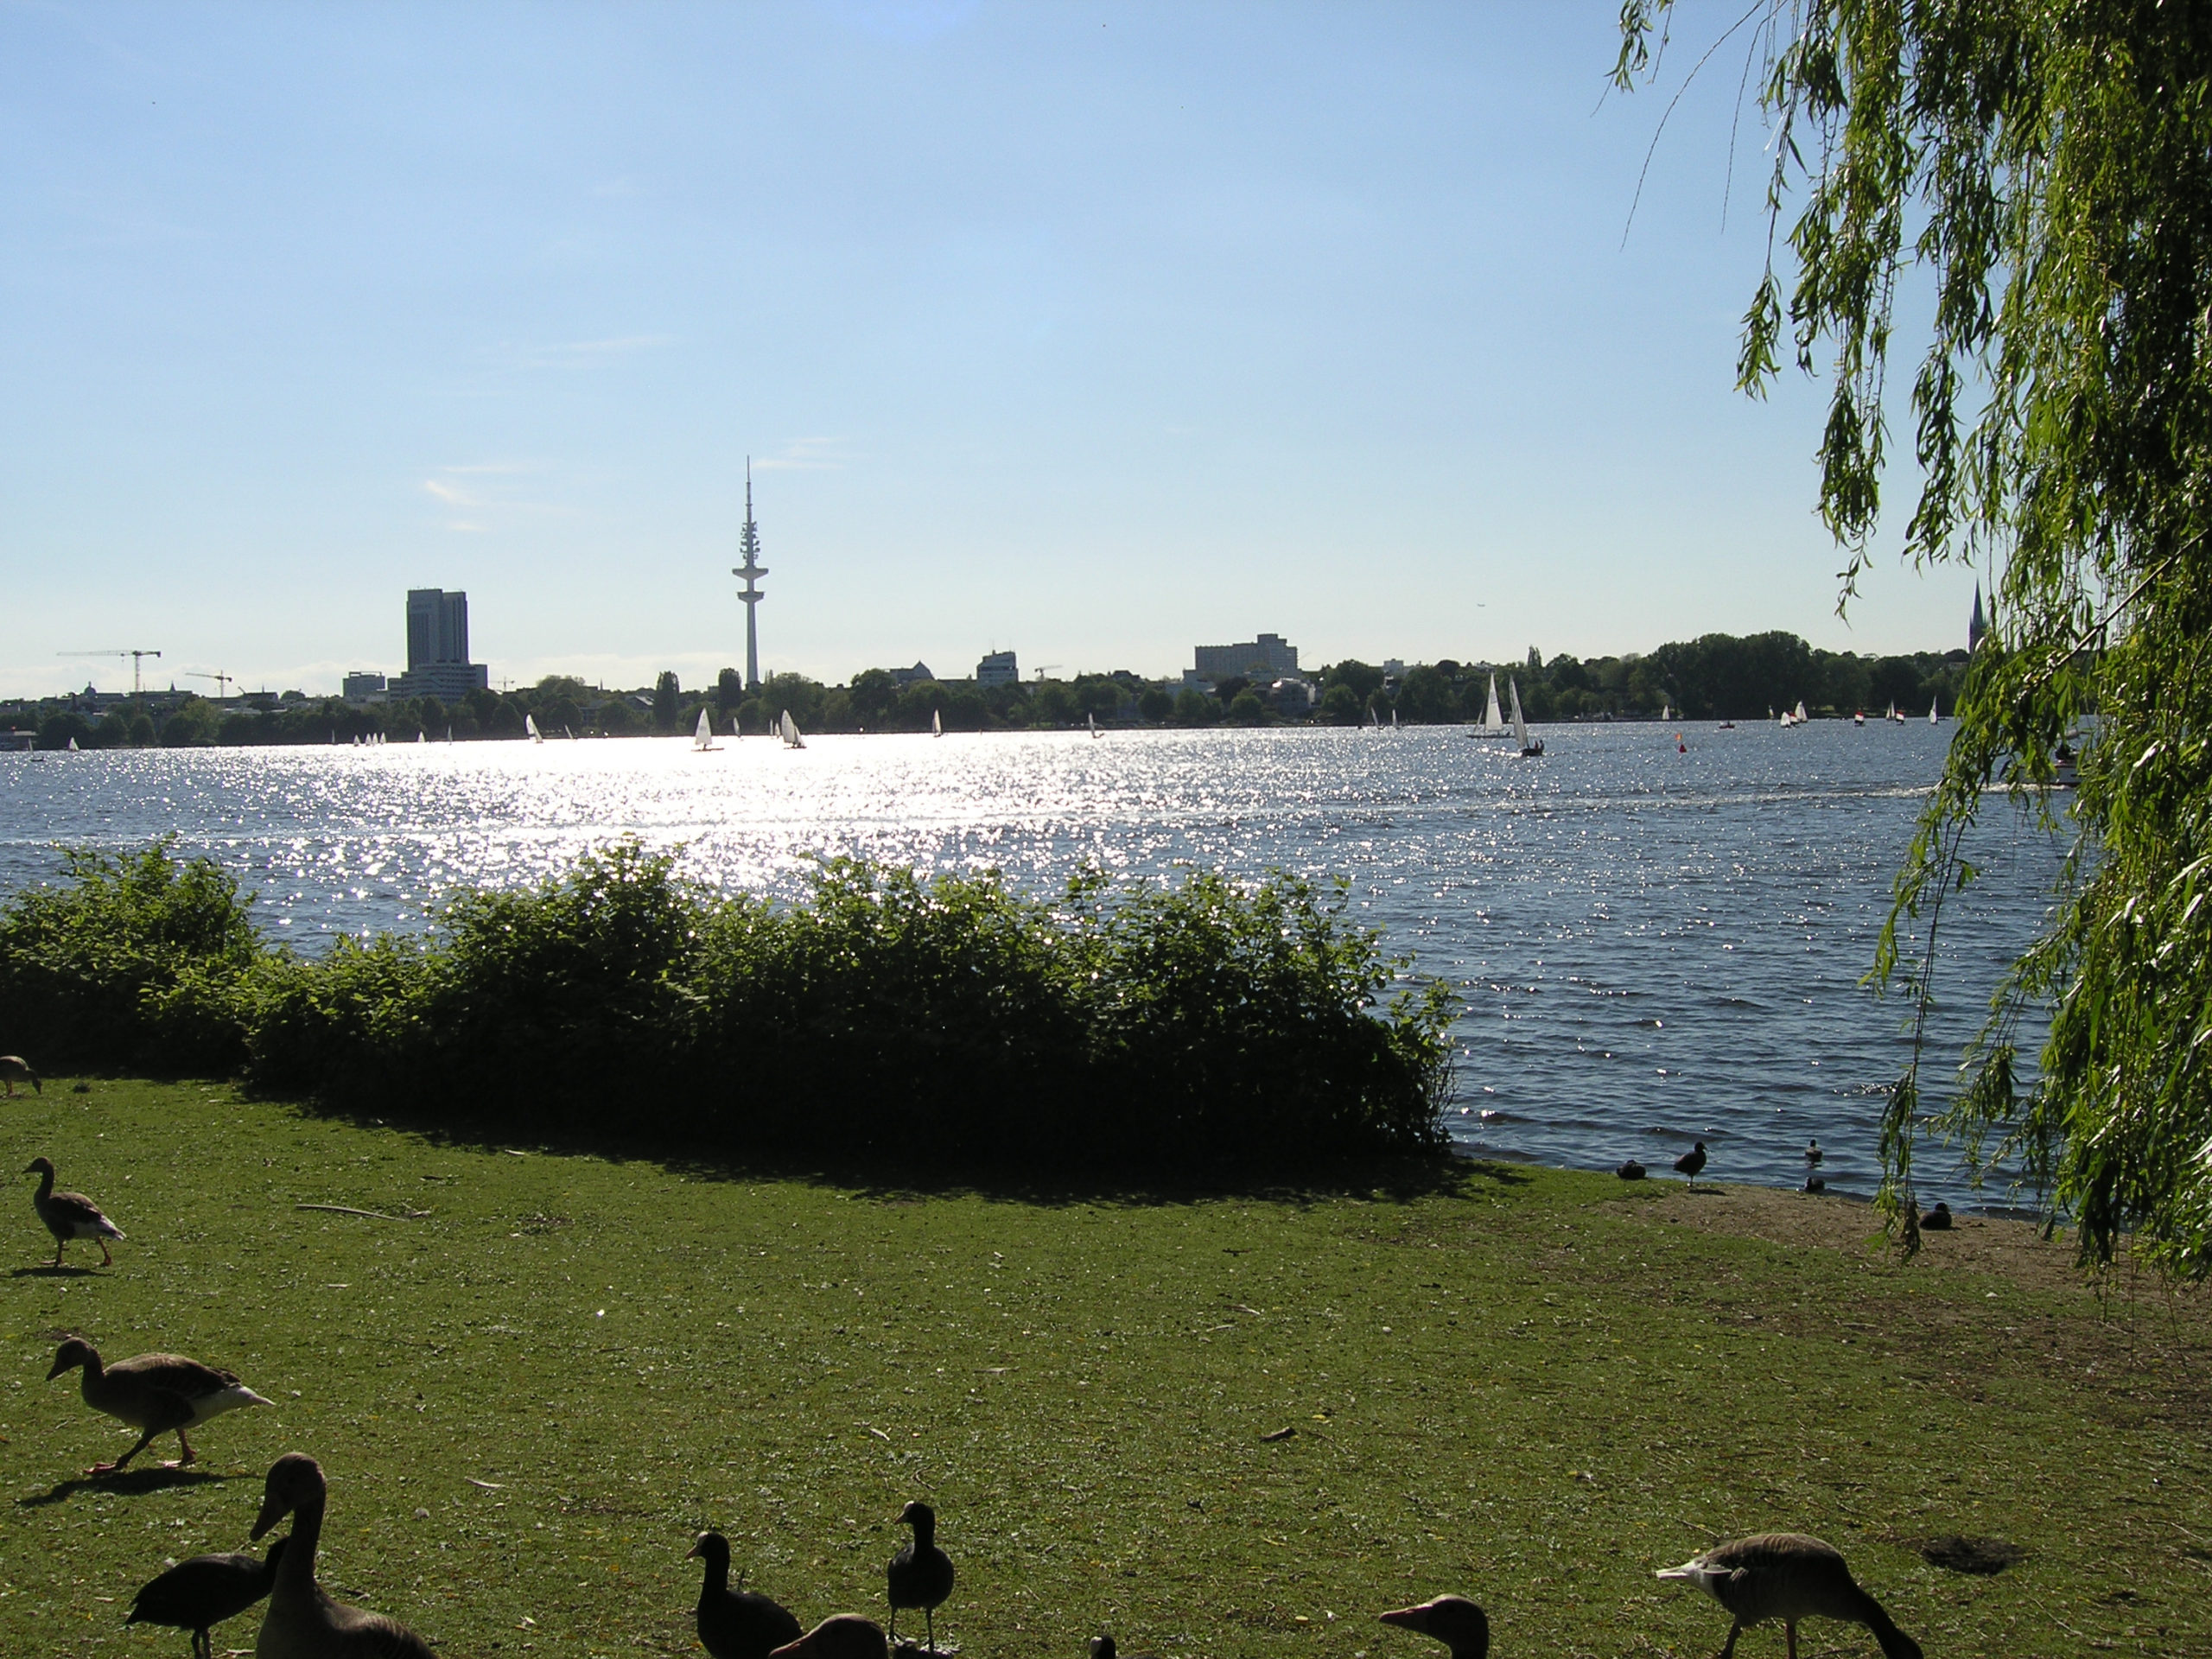 hamburg panorama na miasto, kaczki, woda i łódki